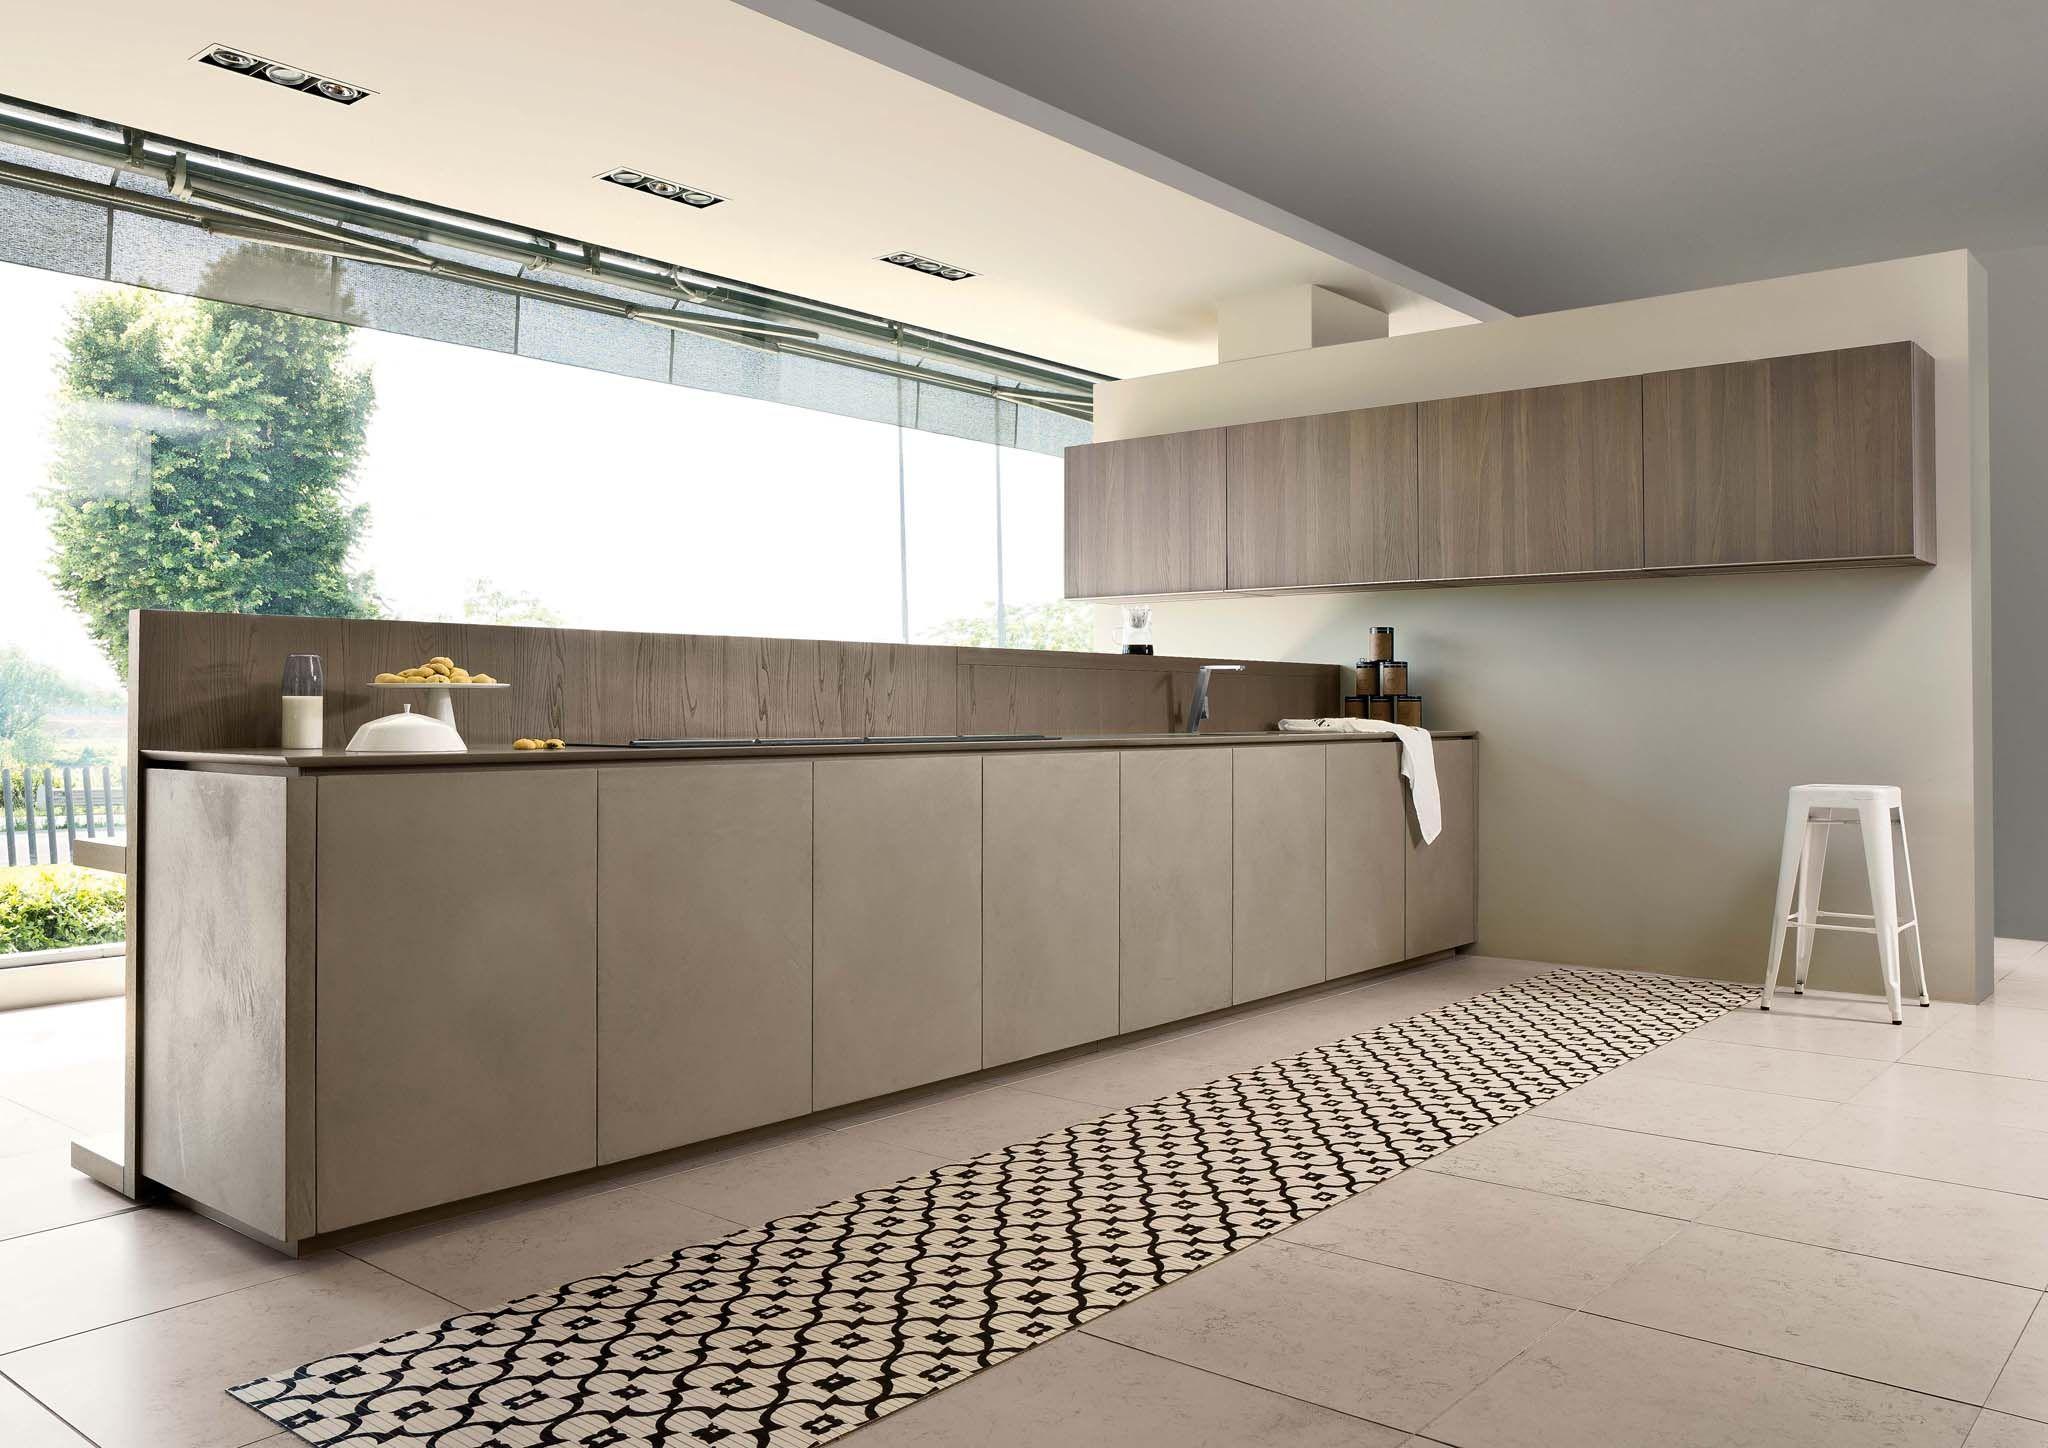 Cucine Moderne e Classiche: La Cucina Italiana by Maistri. http ...